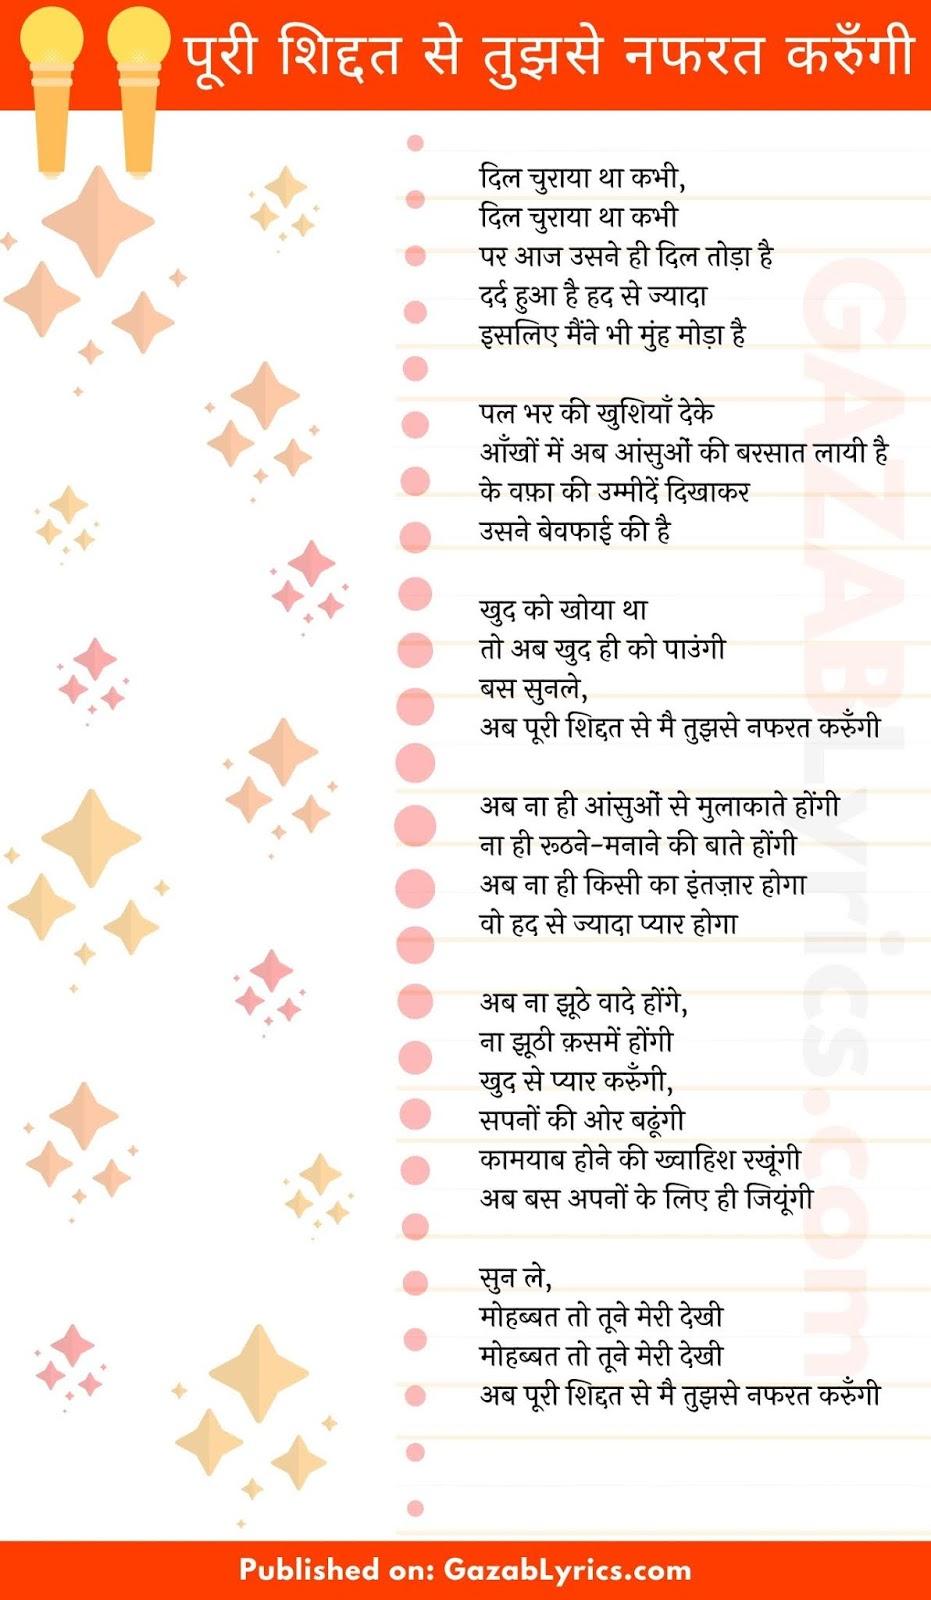 Ab Puri Shiddat Se Tujhse Nafrat Karungi poetry sayali waghmare lyrics image